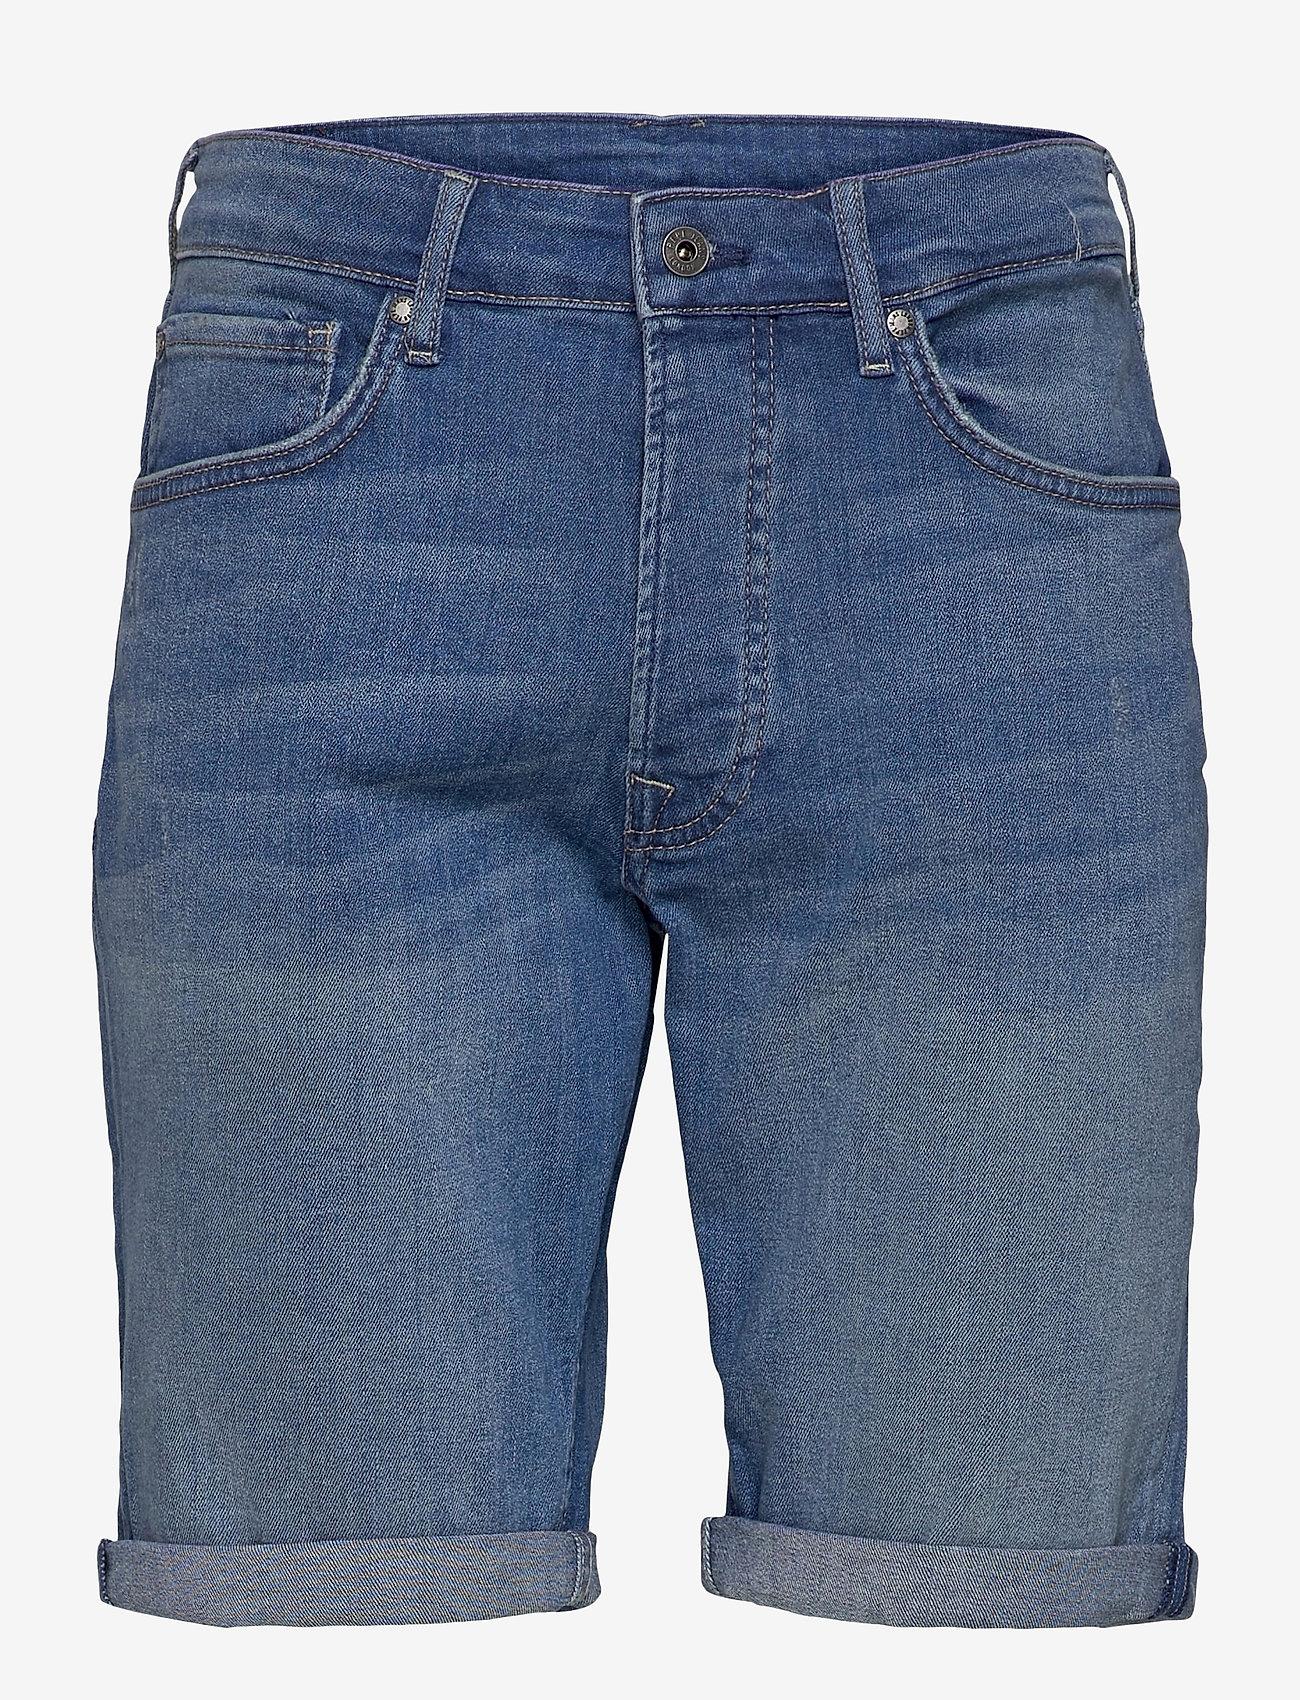 Pepe Jeans London - CALLEN SHORT - denim shorts - denim - 0